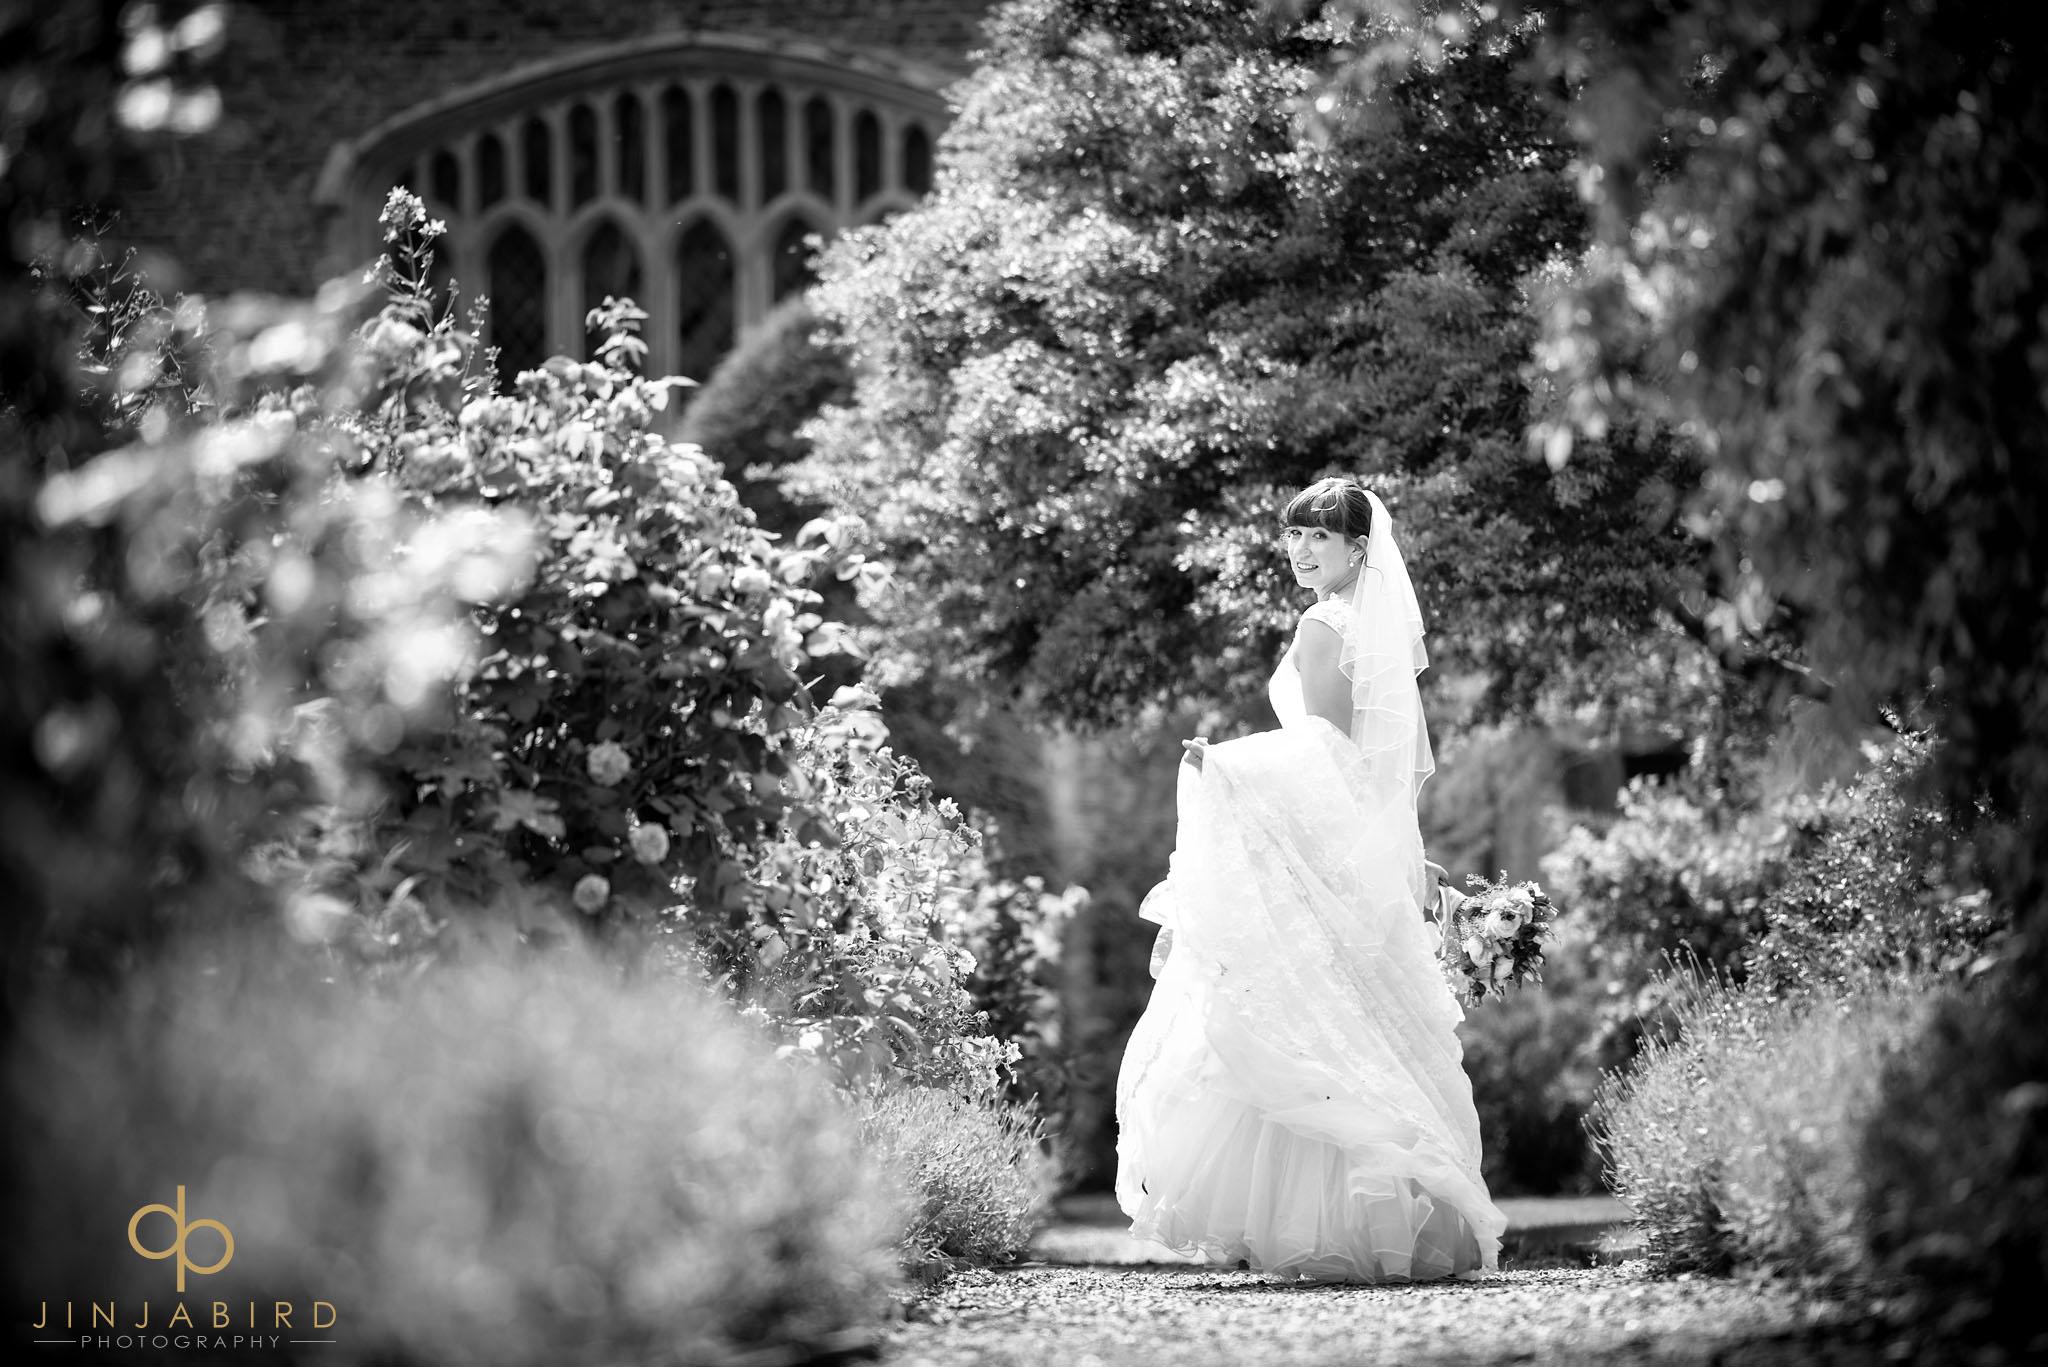 wedding photographer childerley hall